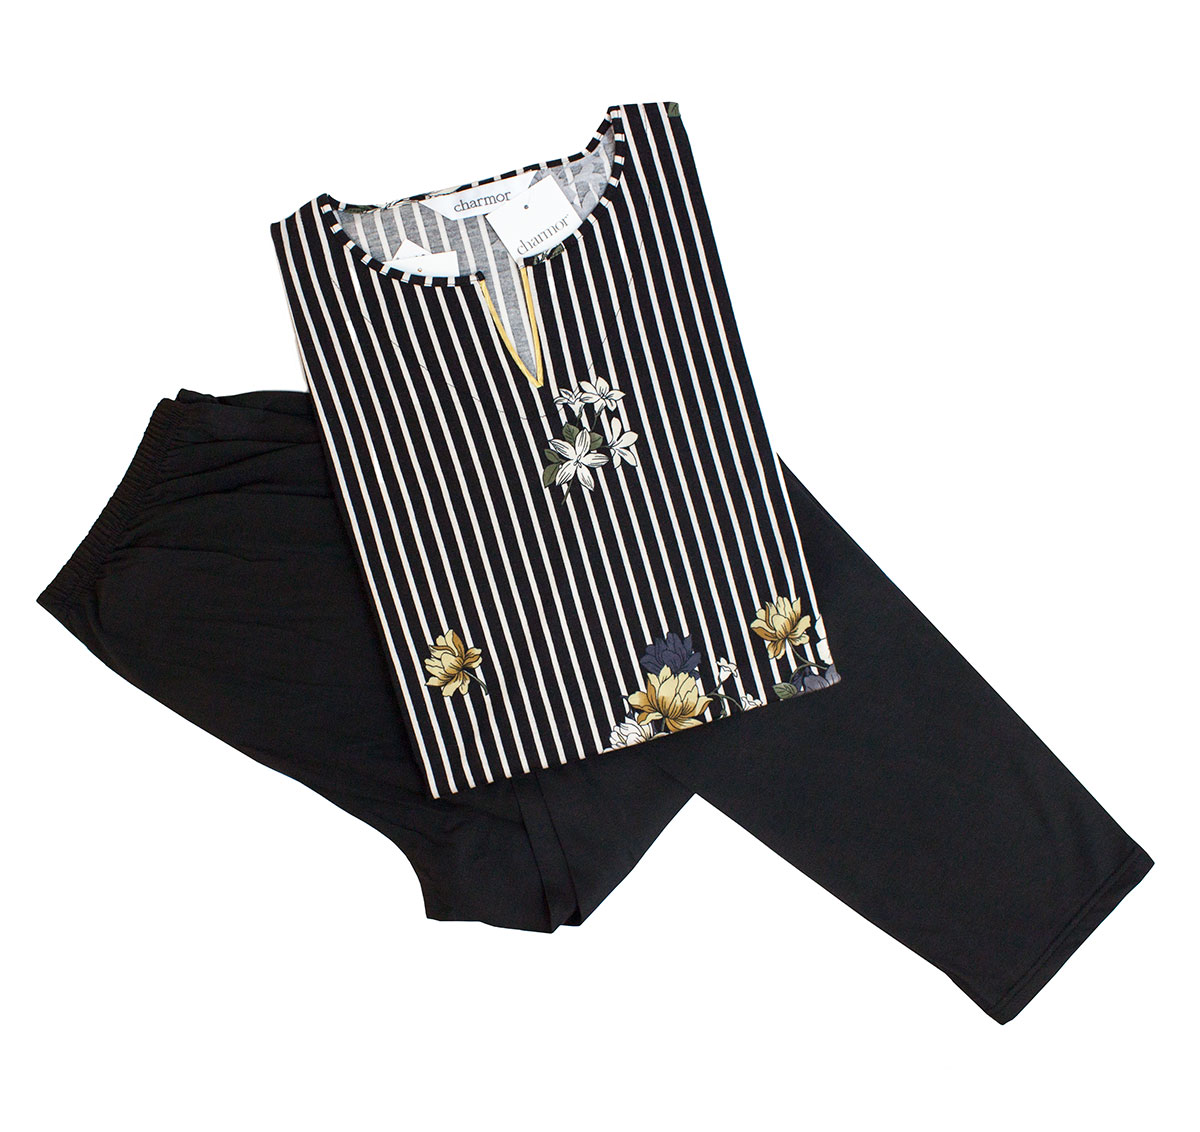 Женский комплект (кофта + брюки) 472570 Charmor